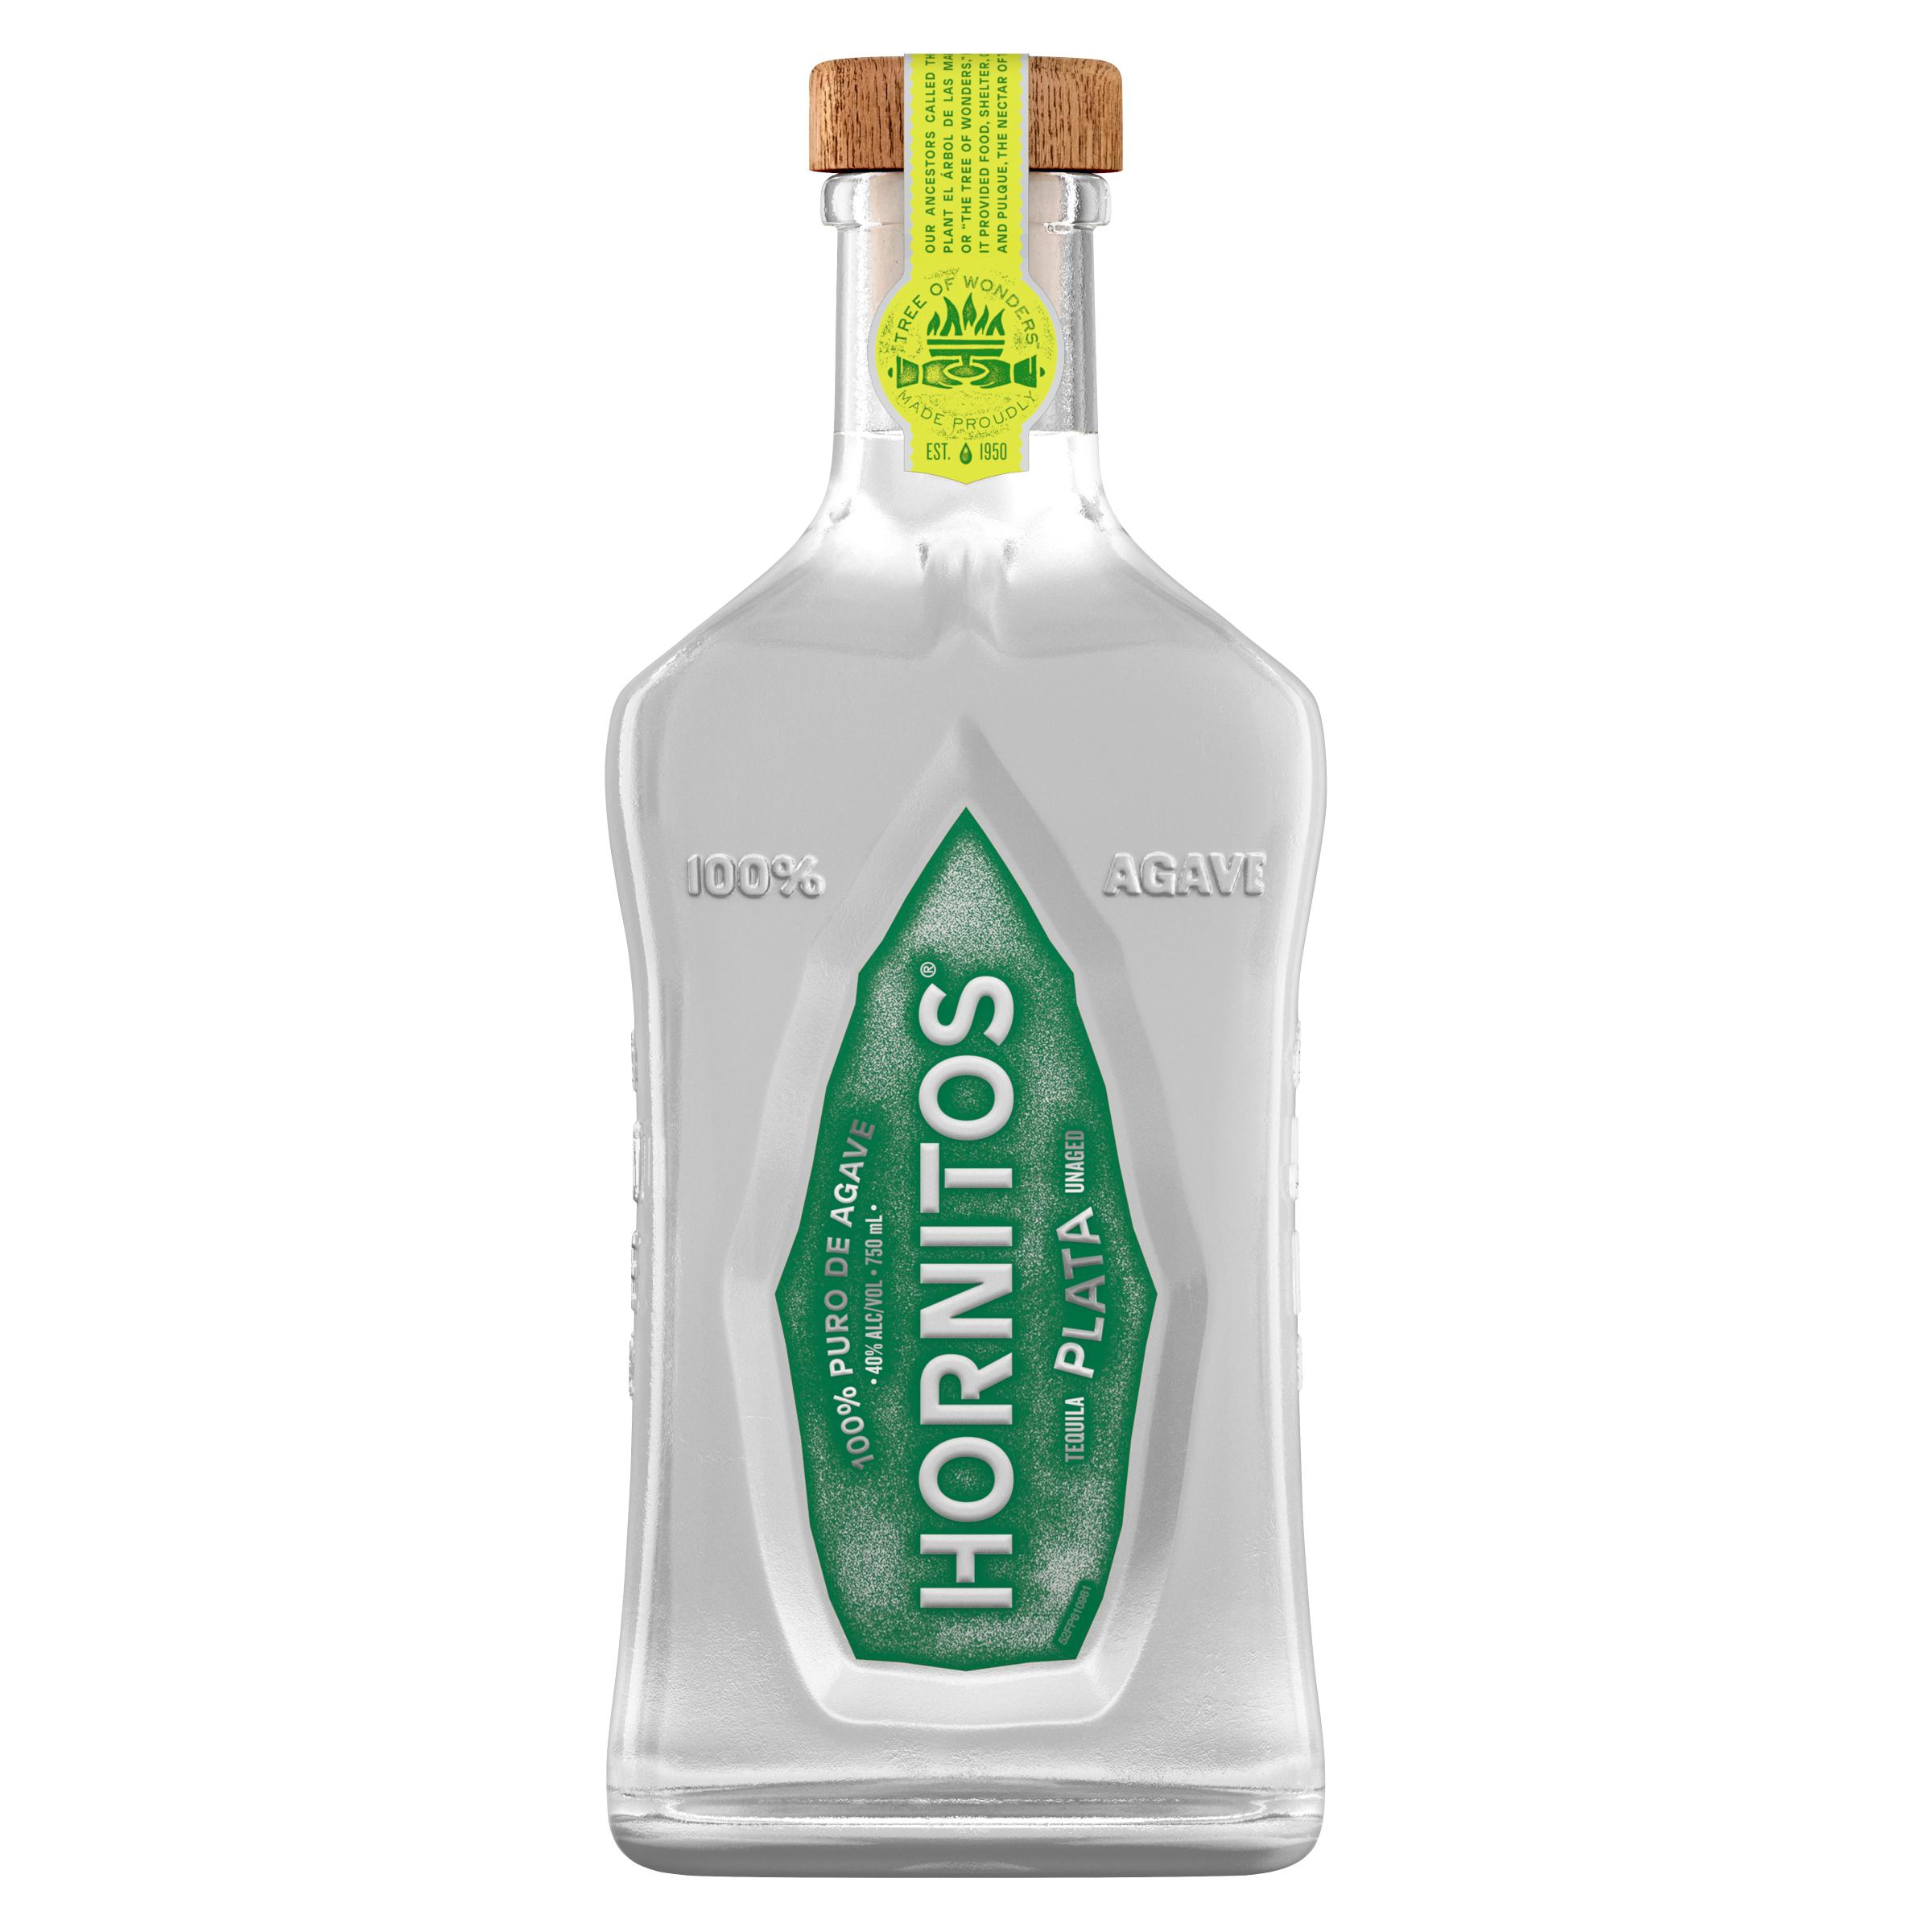 Hornitos Tequila Plata Tequila 100% de Agave